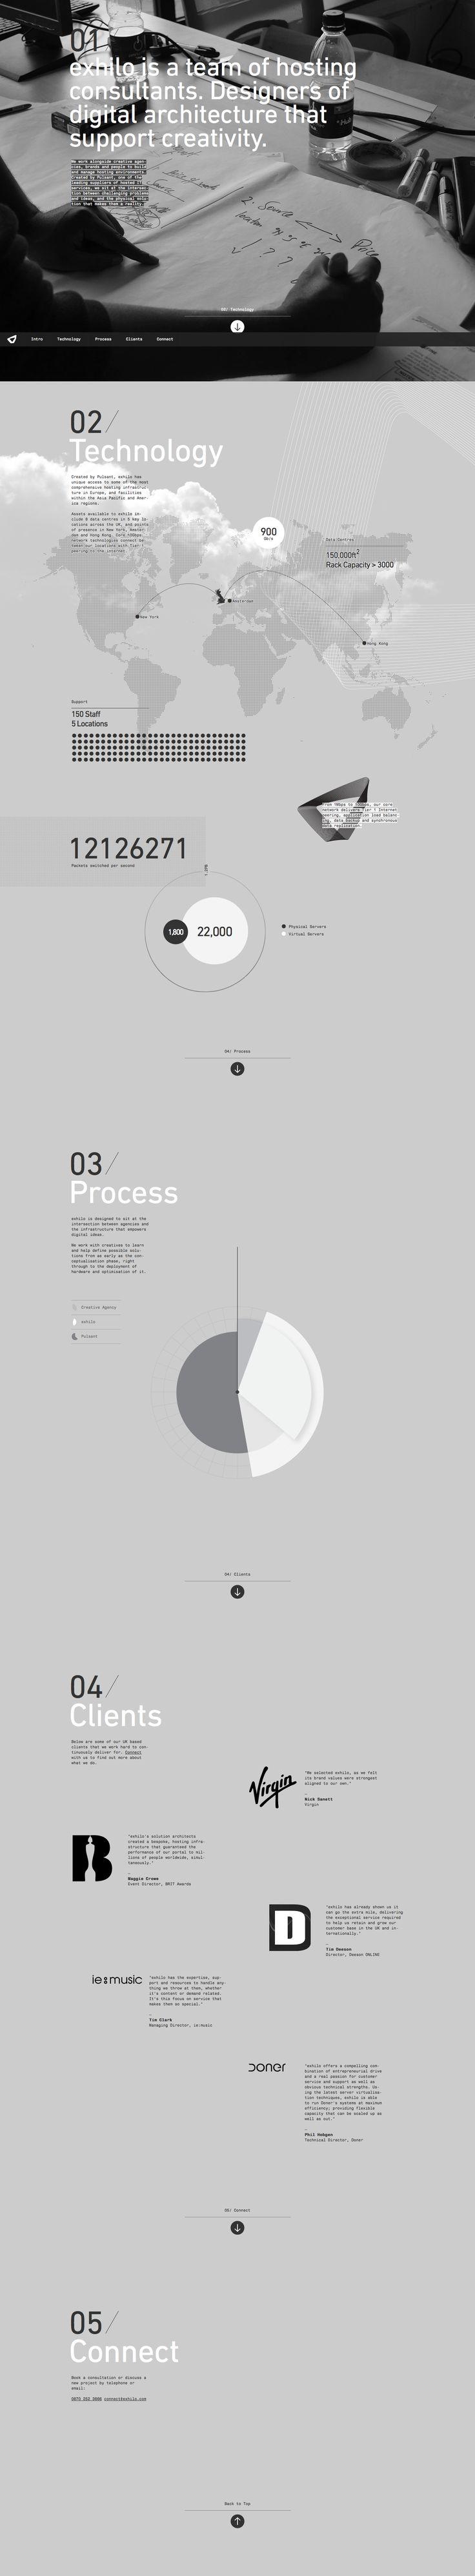 Unique & inspiring: Single Page | Design: UI/UX. Apps. Websites | Exhilo |